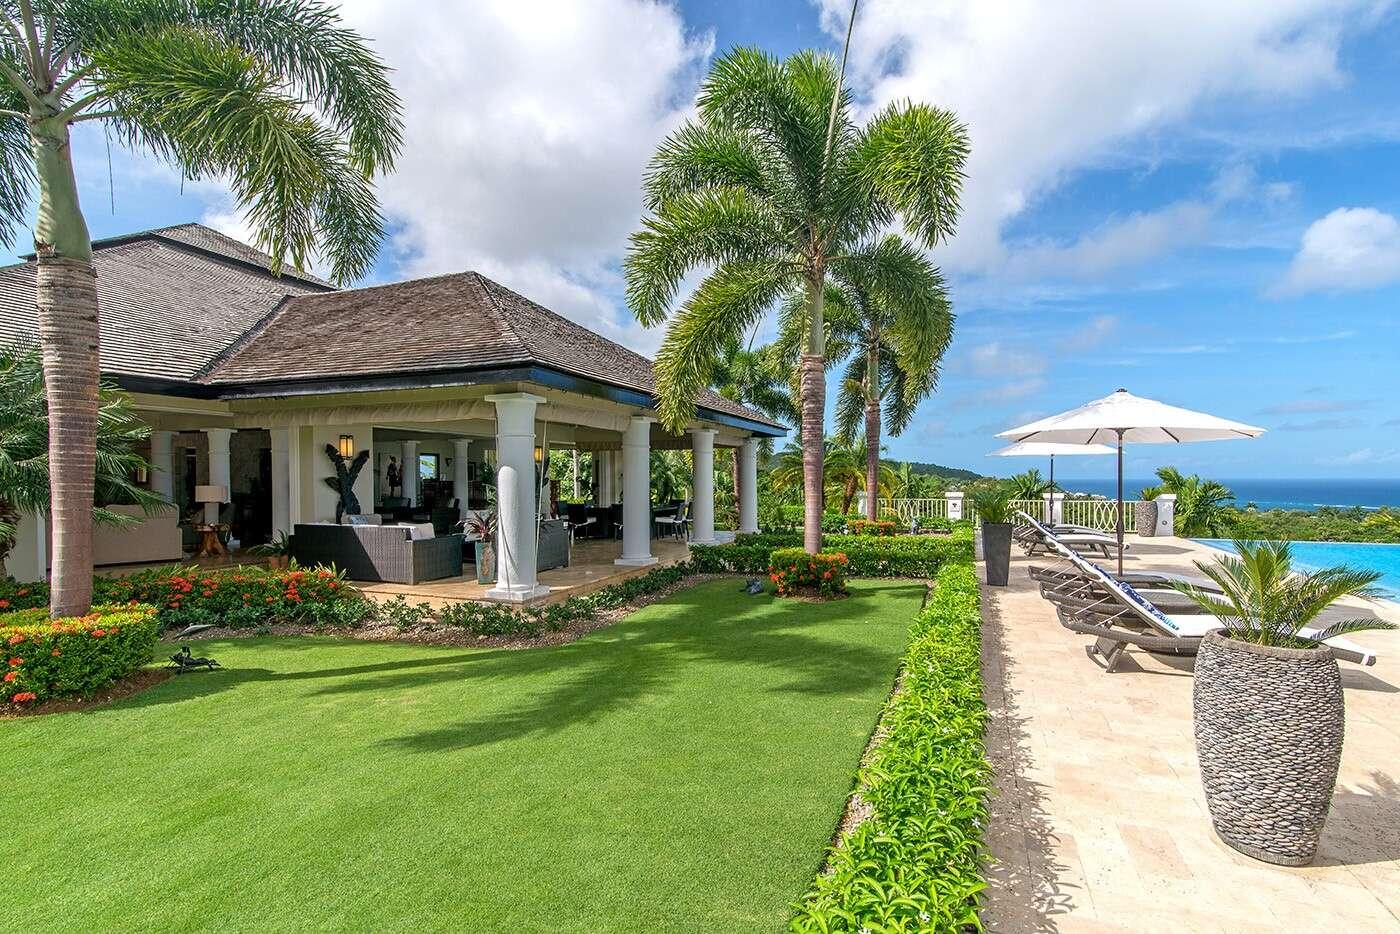 Luxury villa rentals caribbean - Jamaica - Try all club - No location 4 - Harmony Hill - Image 1/29